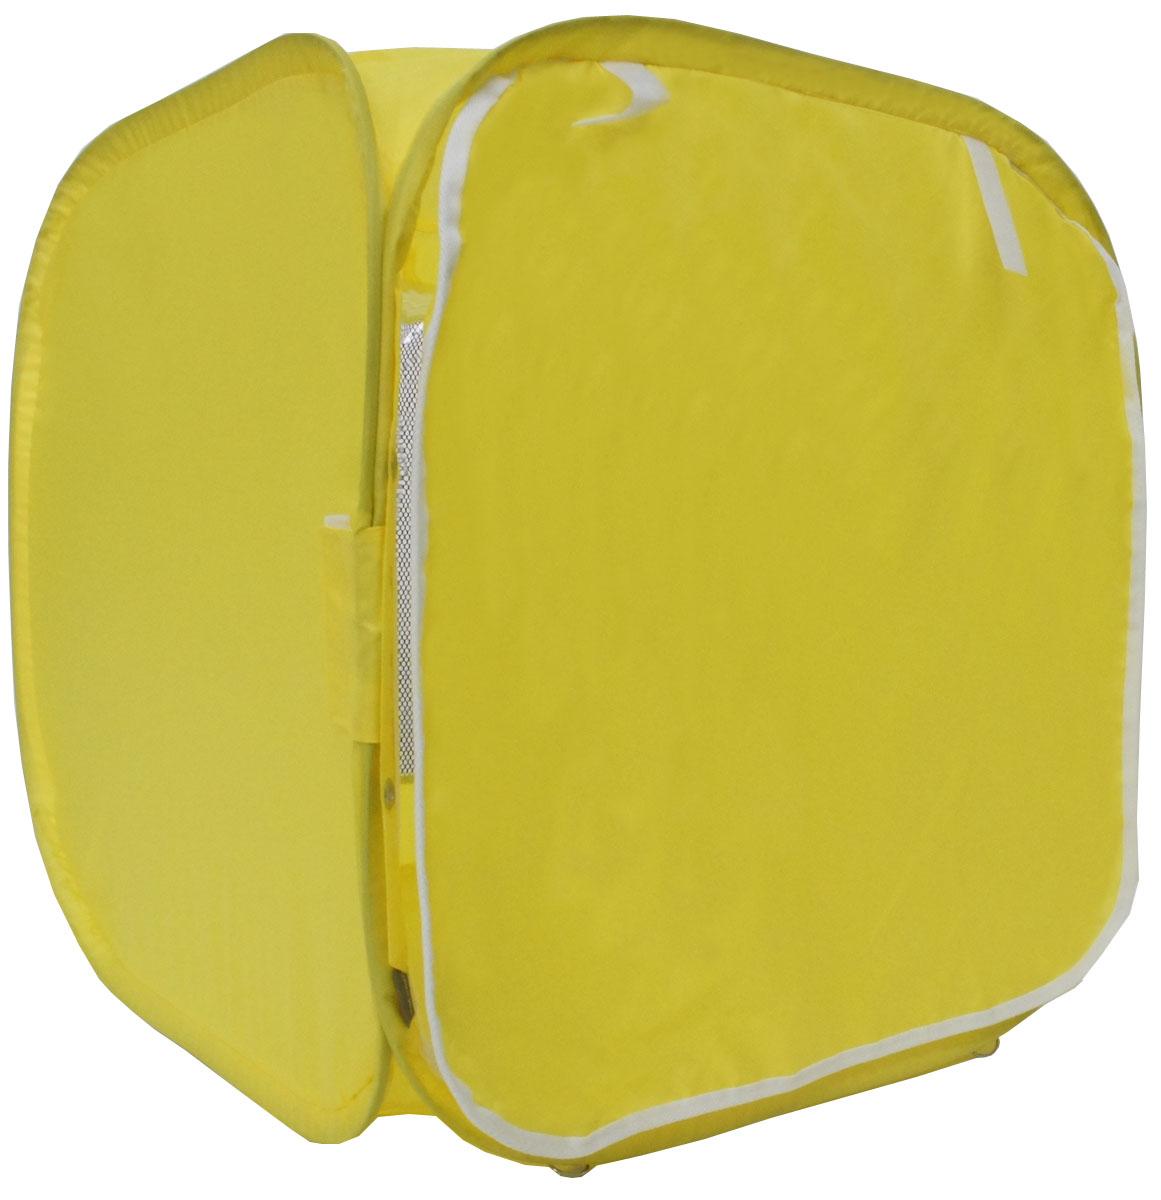 "Палатка для выставки животных ""Шоу-Петс"", цвет: желтый, 60 х 60 х 60 см. ПВЛ1Ж"